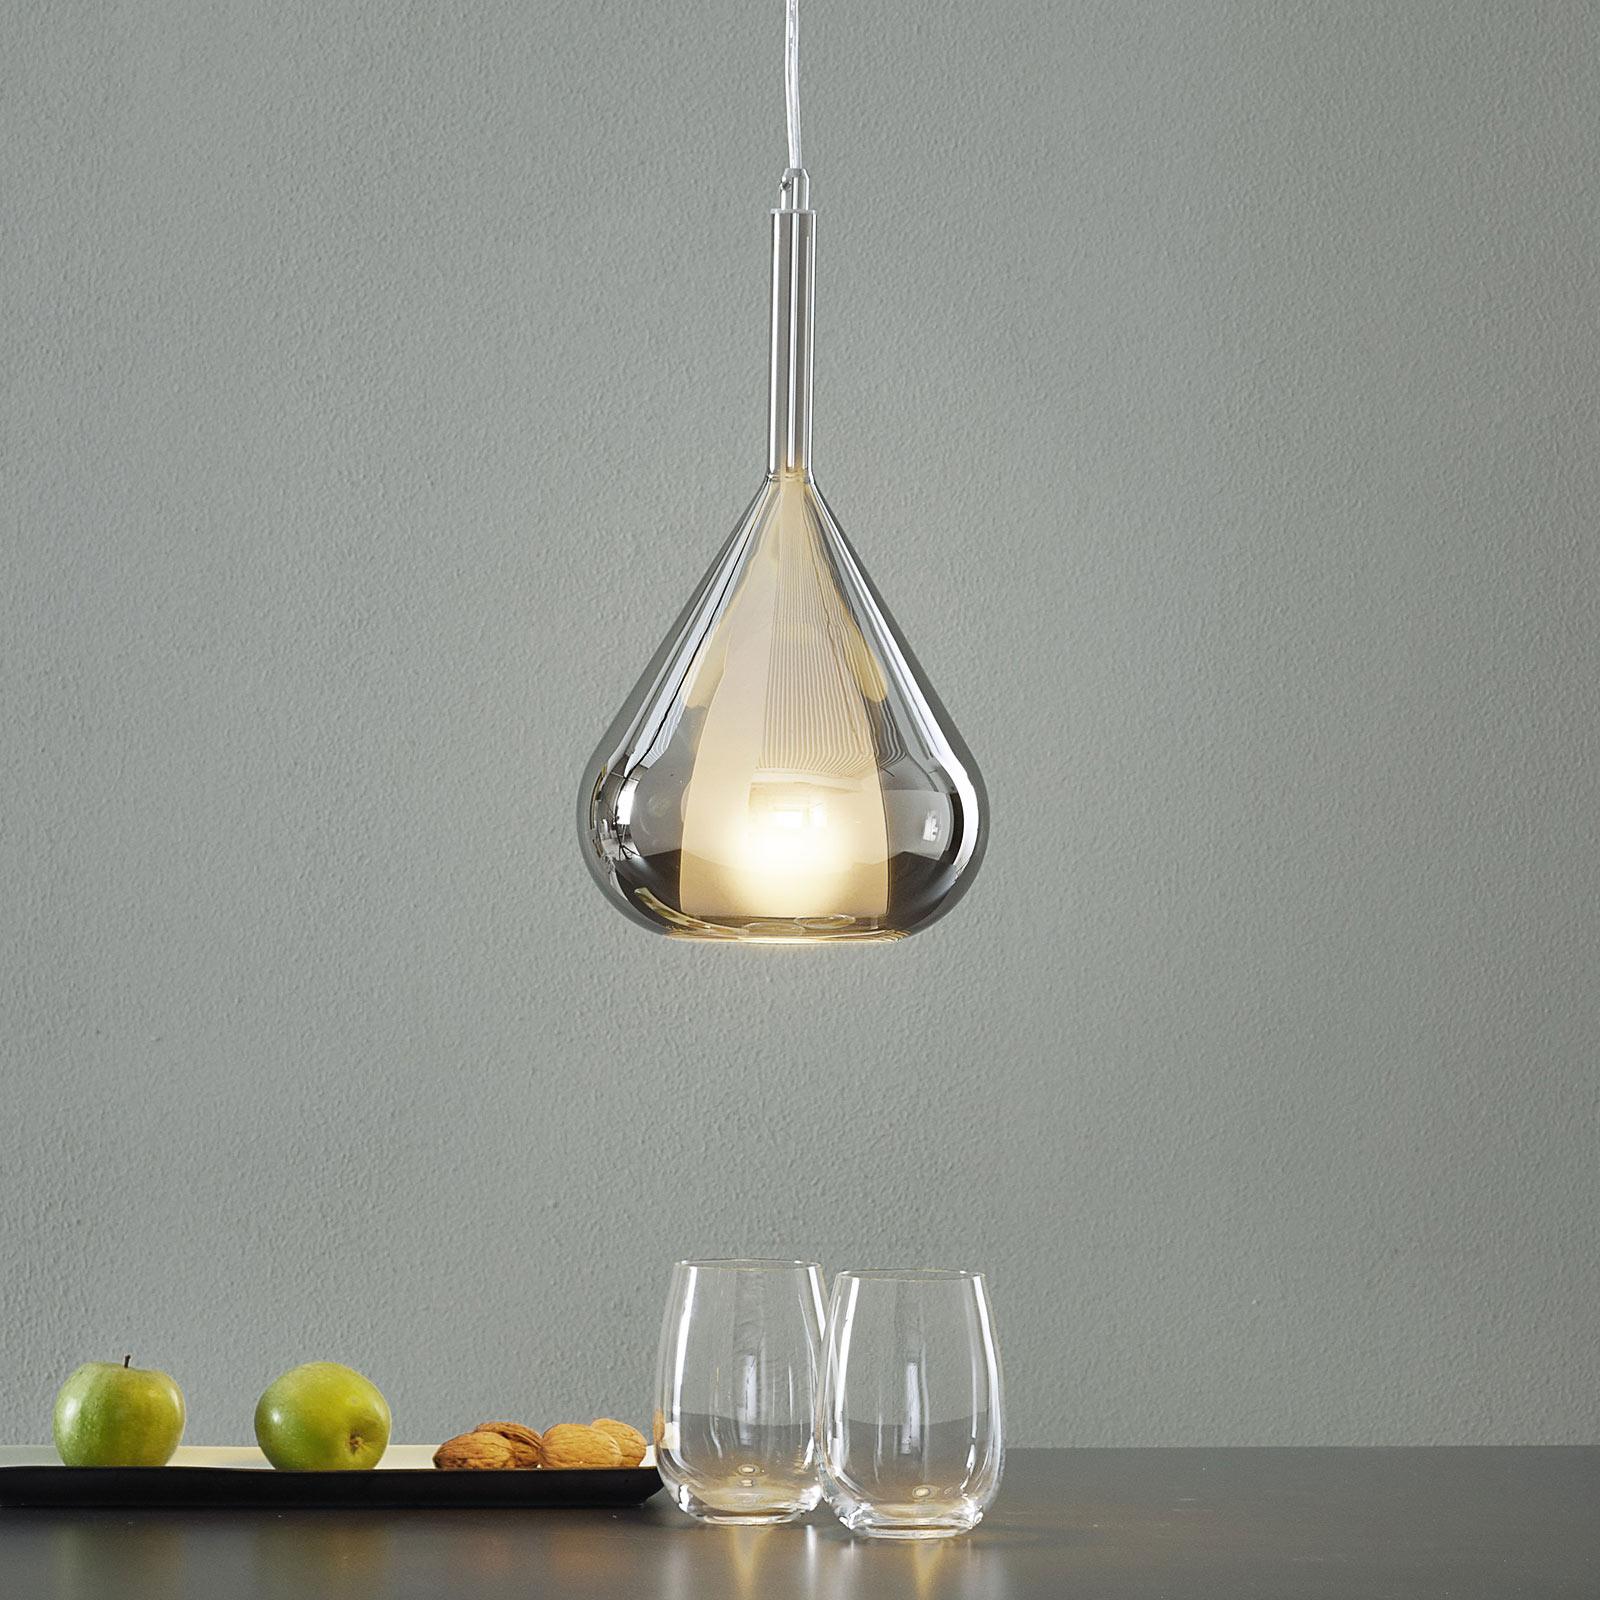 Lampa wisząca Lila, szklany klosz kropla, szara